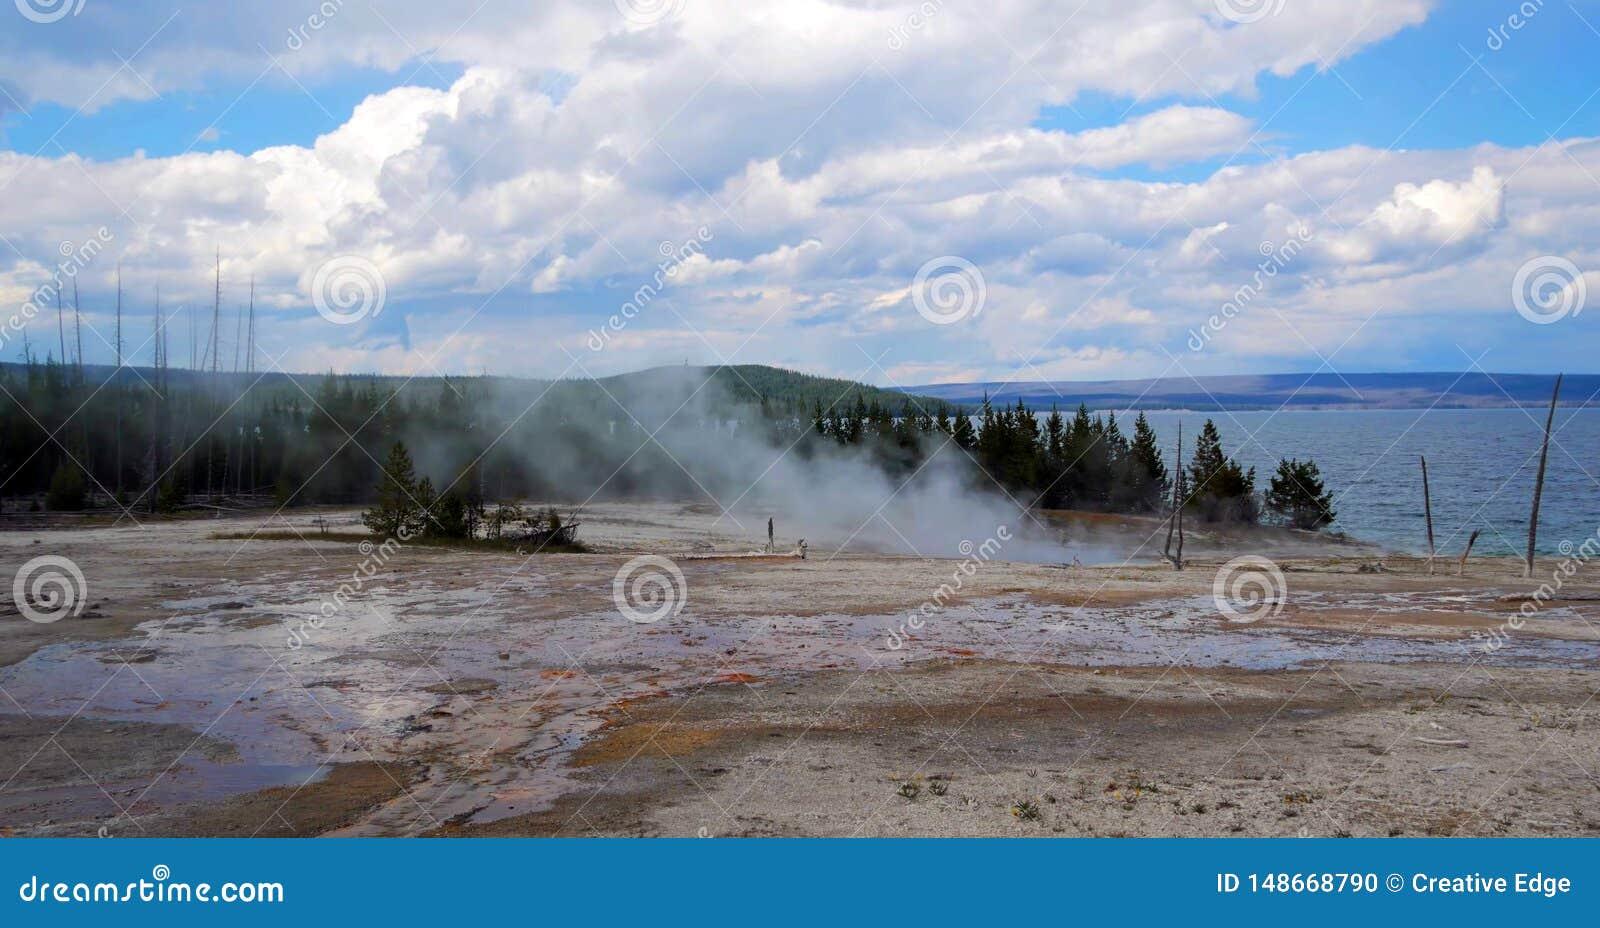 Stock image of West Thumb Geyser Basin, Yellowstone National Park, USA